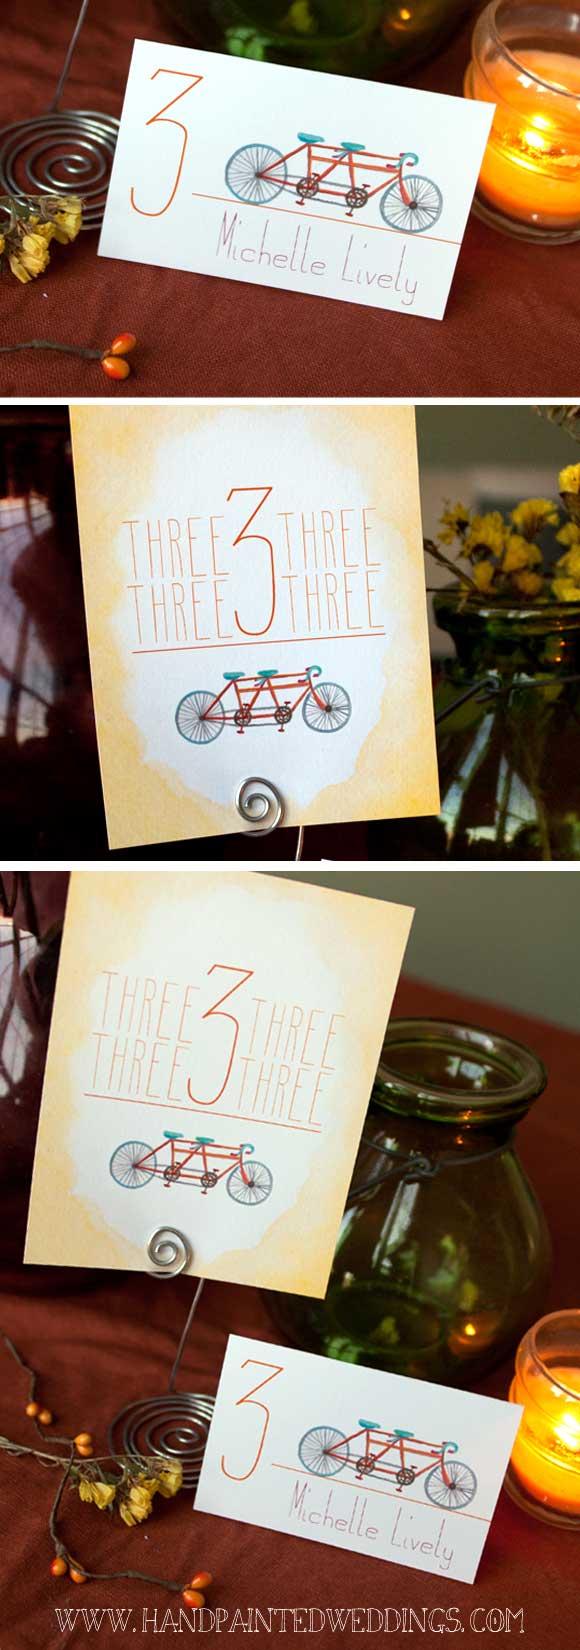 Hand-Painted Reception: Tandem Bike theme